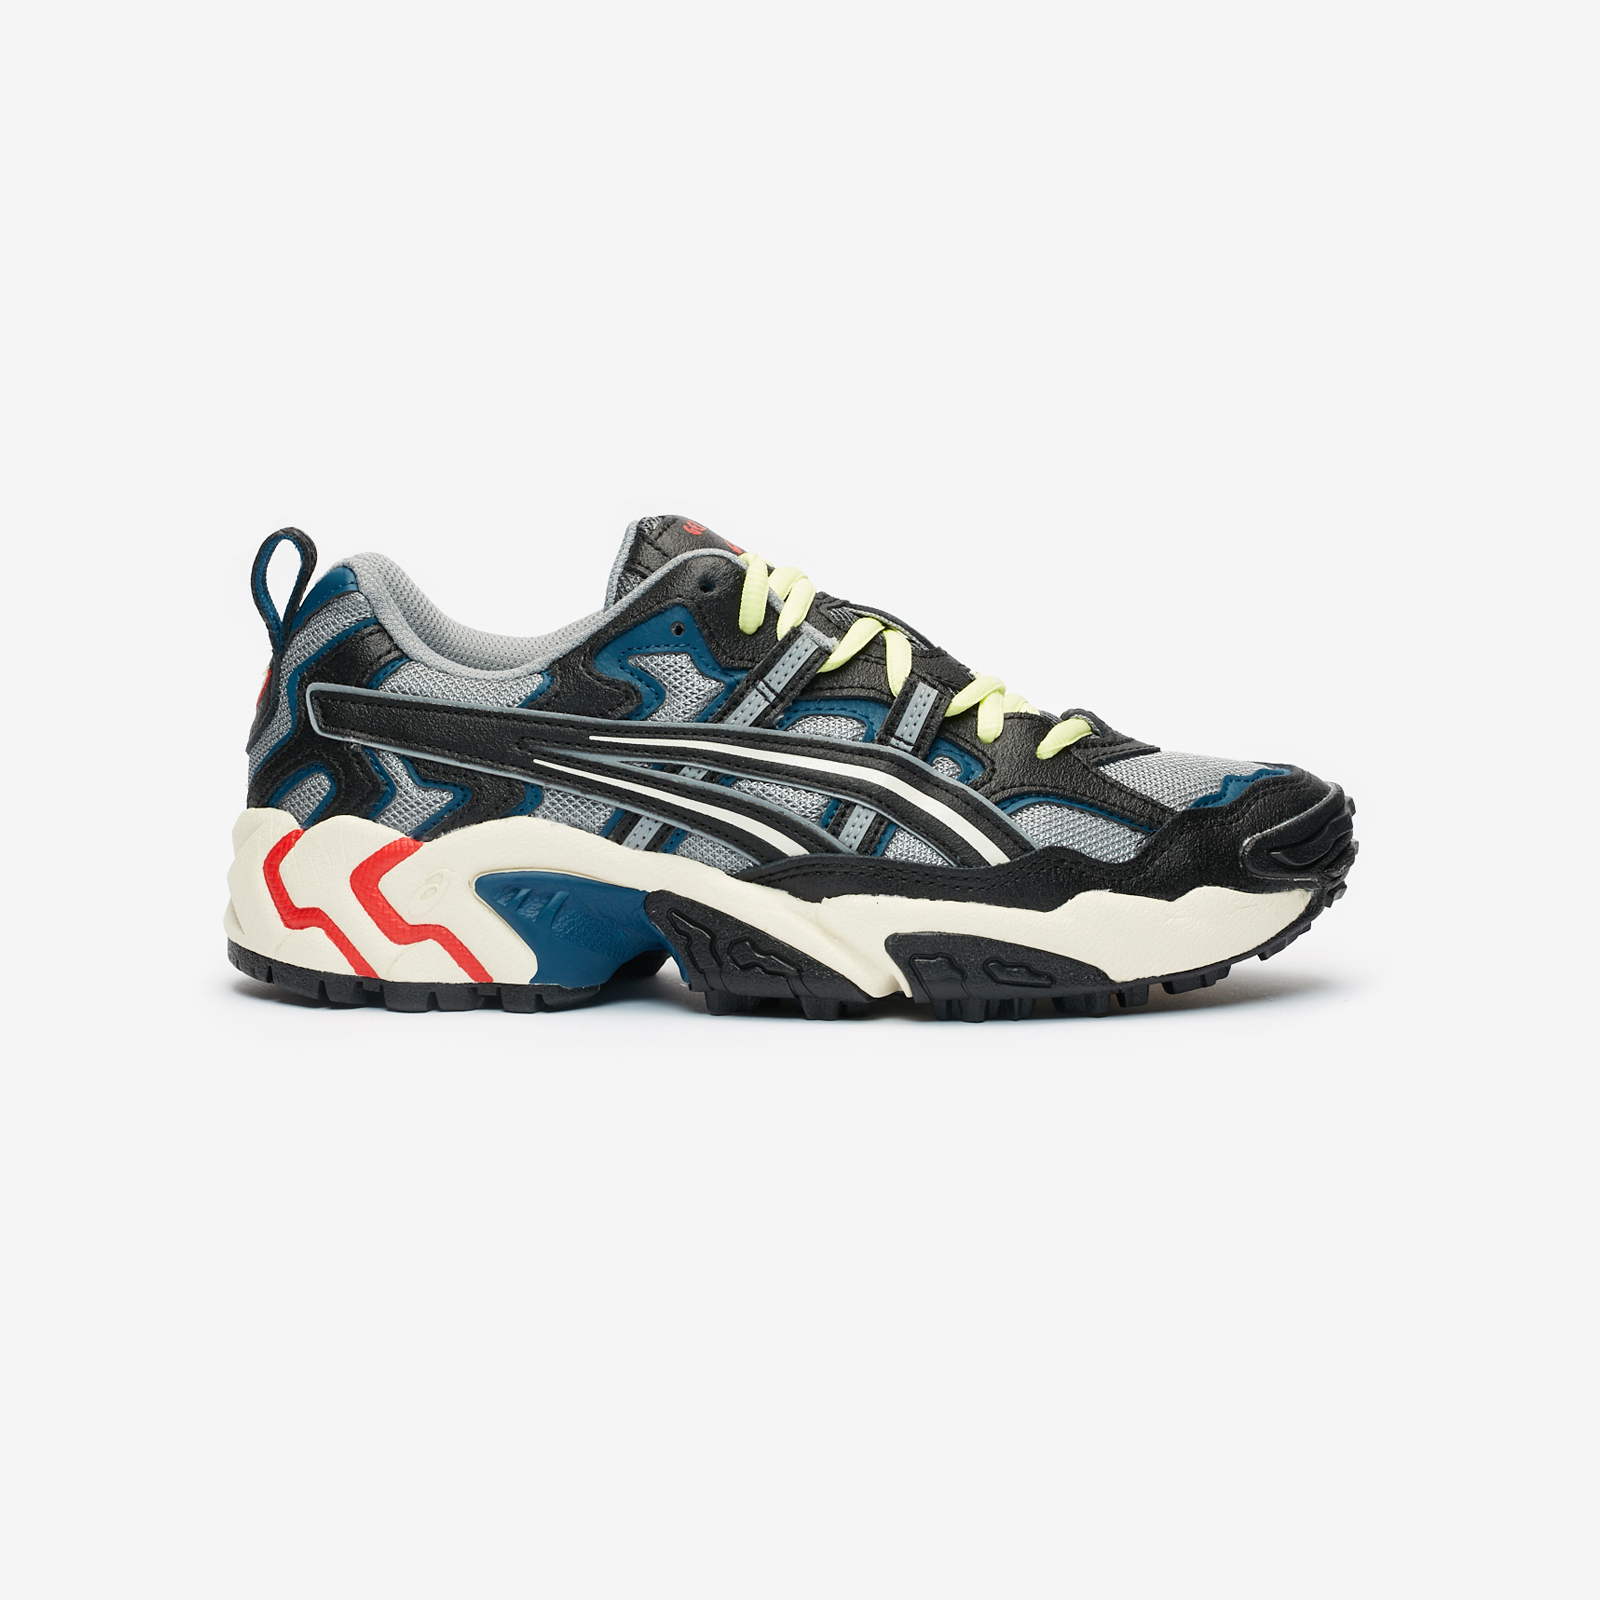 Asics Sportstyle Gel-Nandi OG - 1021a315-022 - SNS | sneakers ...